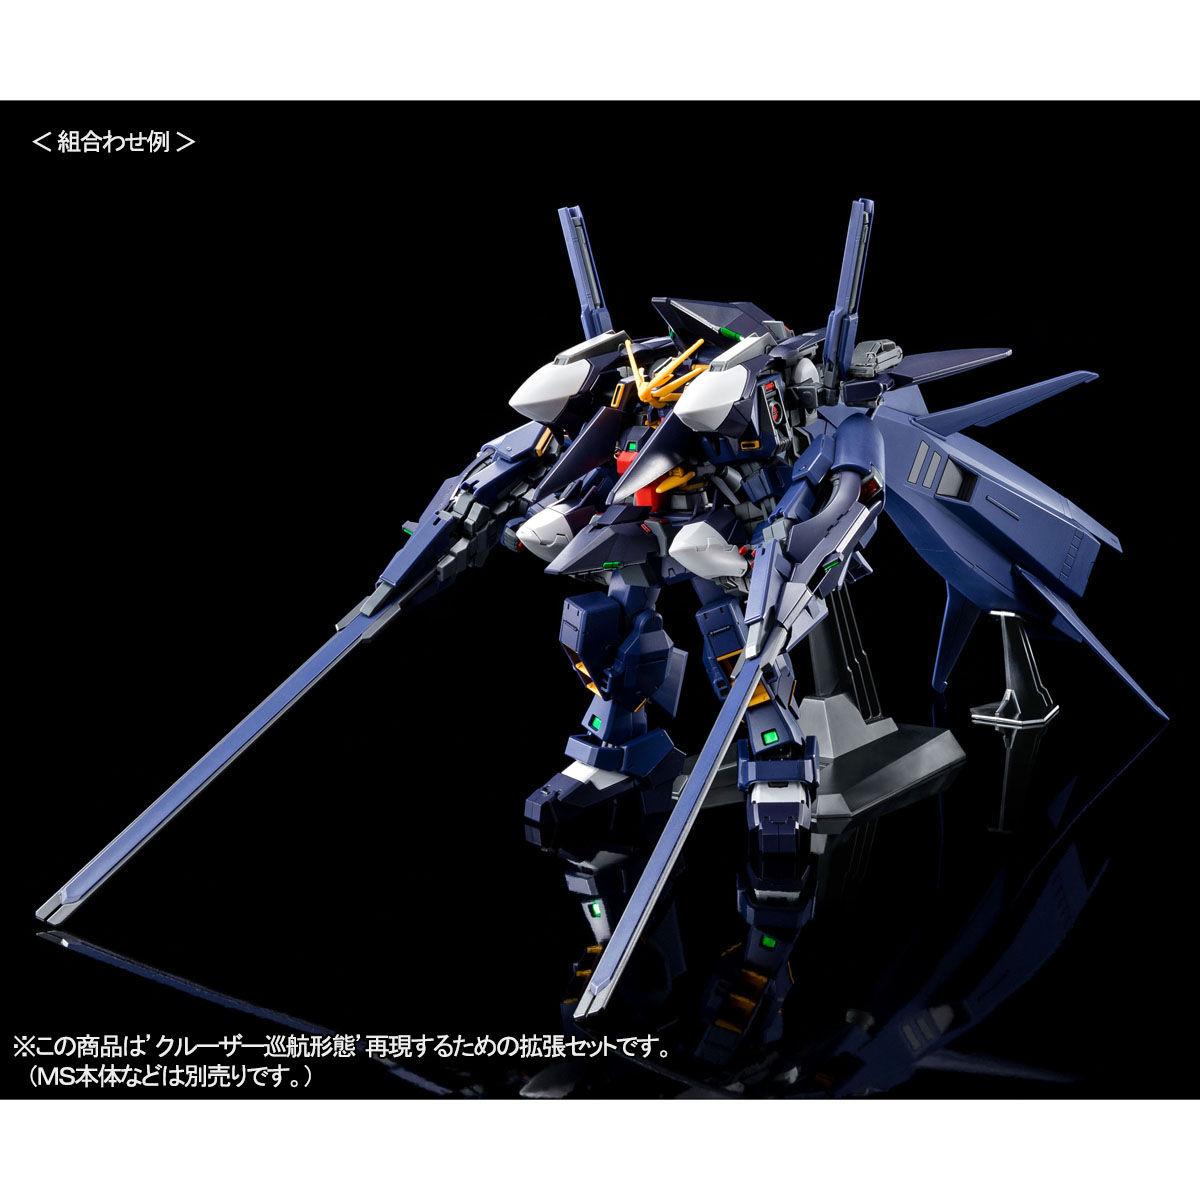 RX-121-3C ガンダムTR-1〈ハイゼンスレイ・ラーII〉クルーザー巡航形態 [Gundam TR-1 (Hyzenthlay-Rah II)]